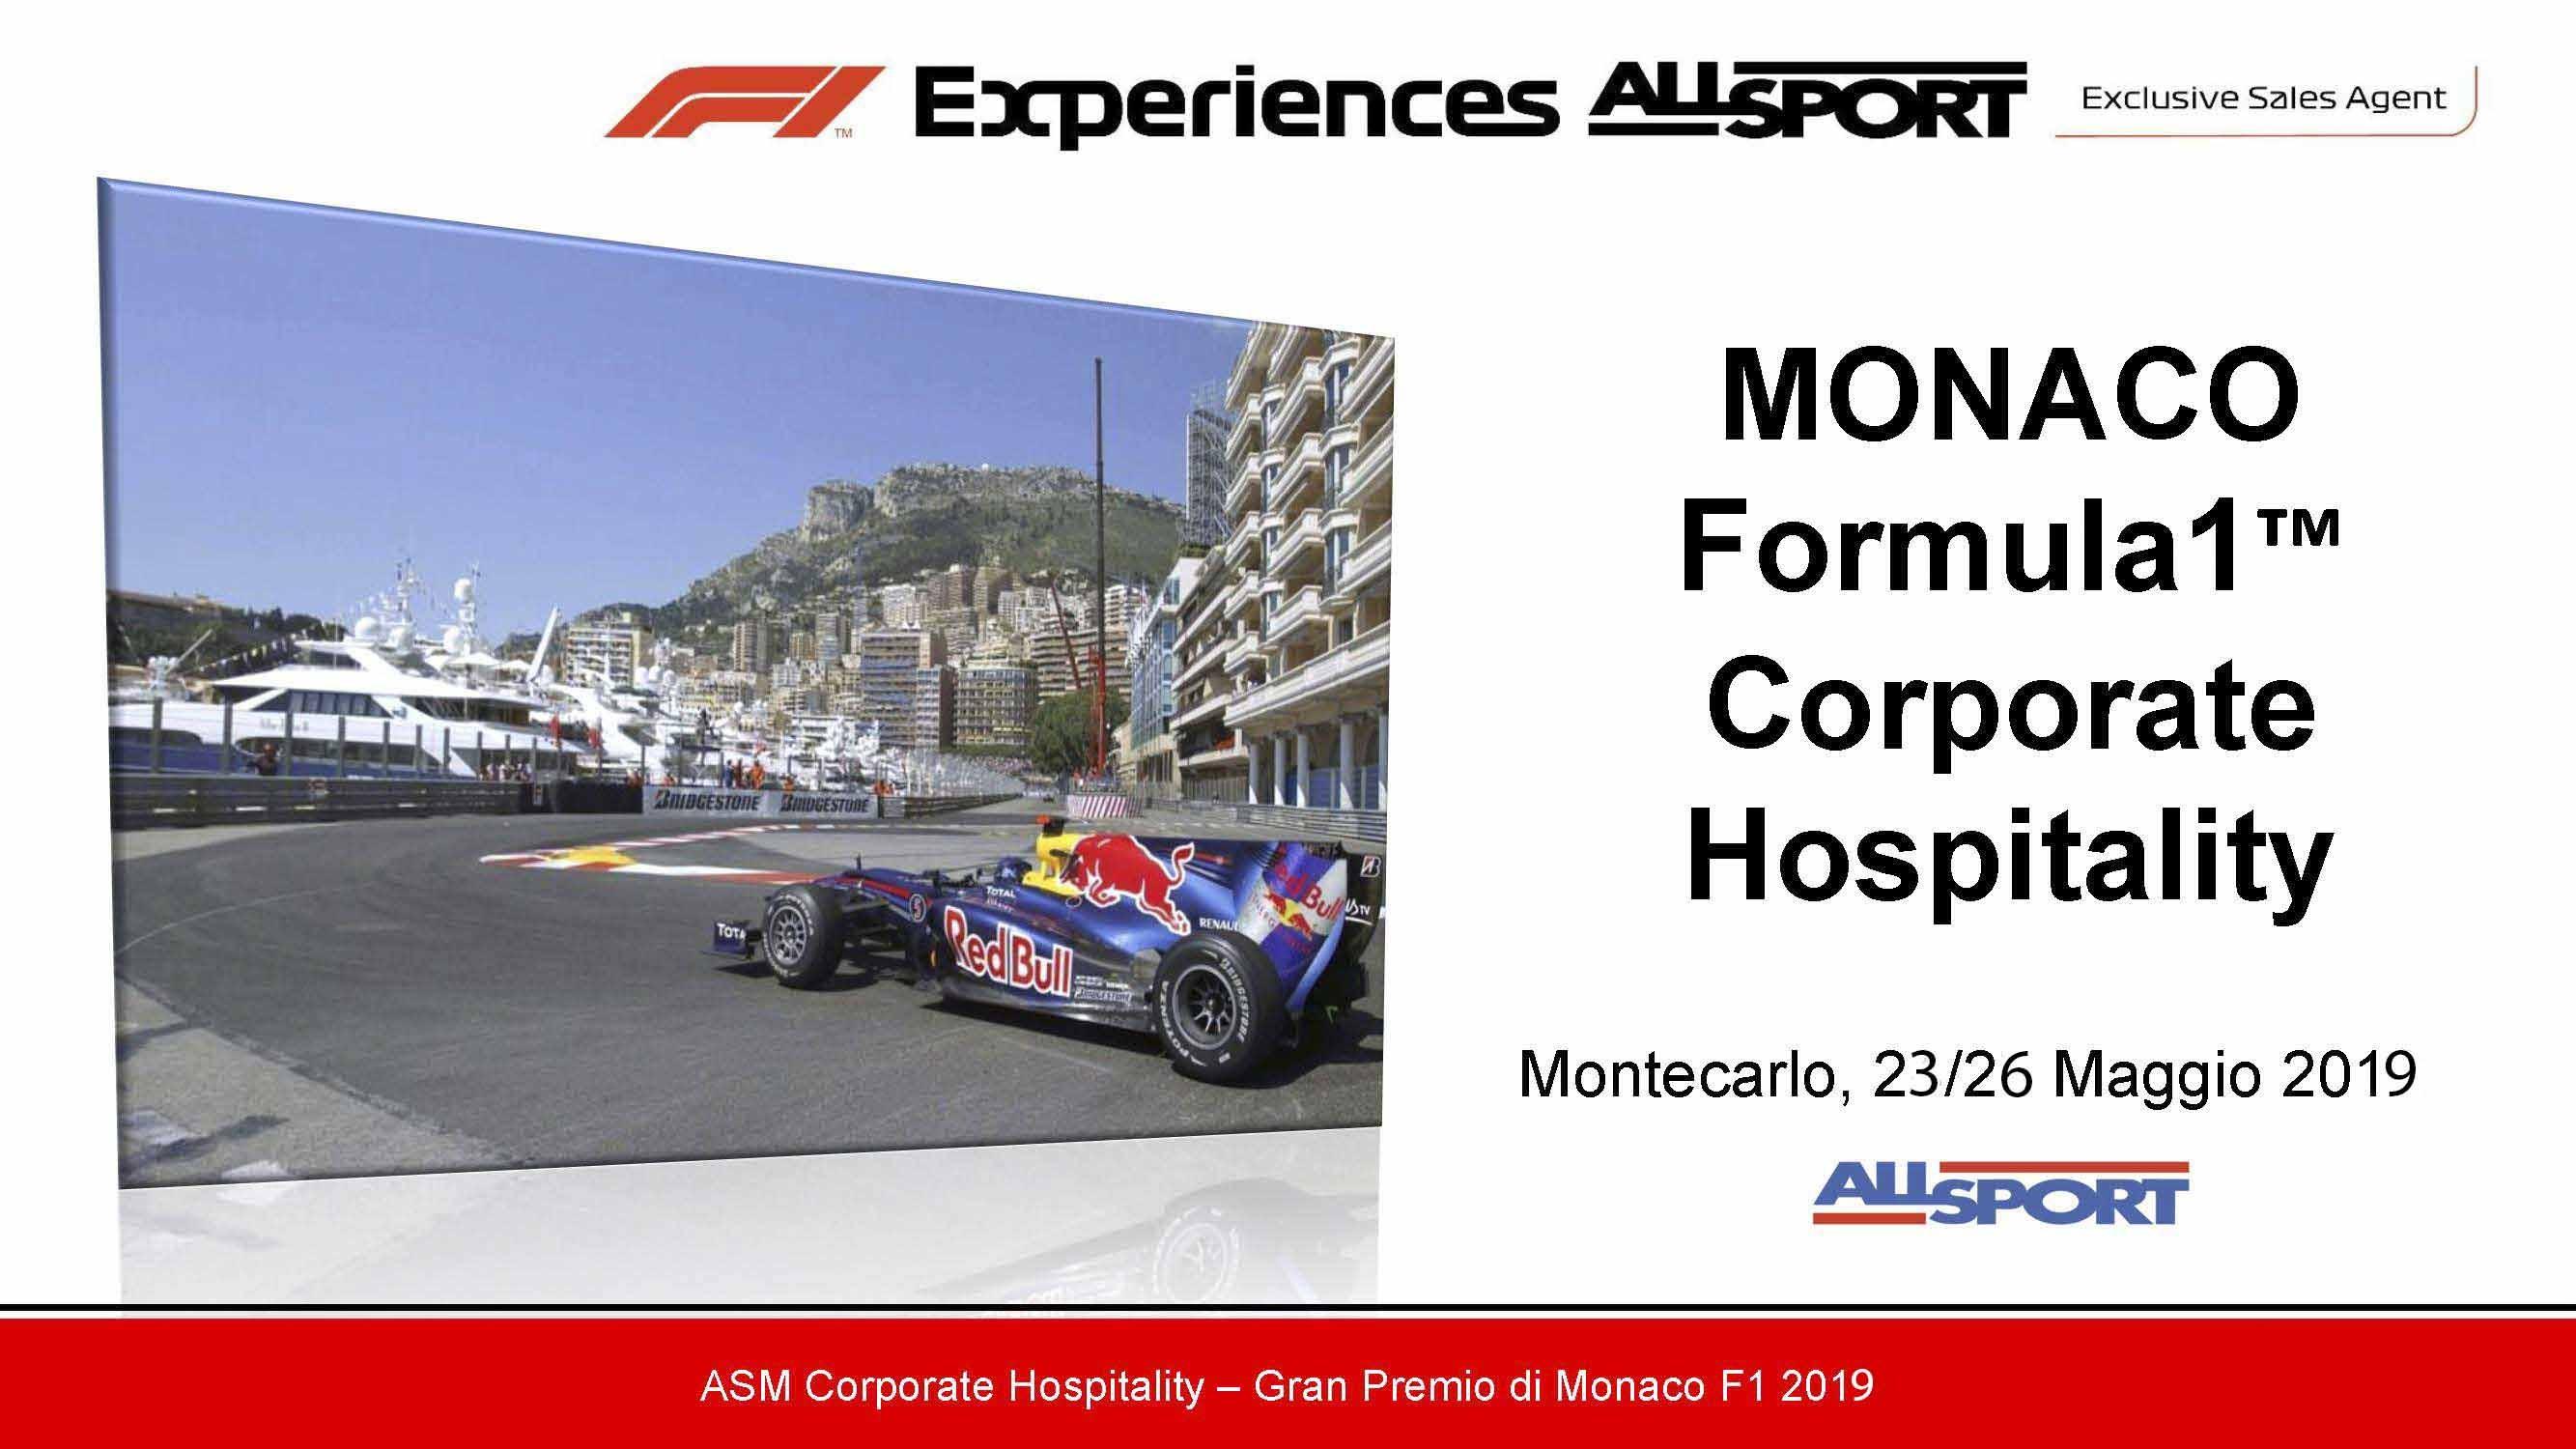 F1 EXPERIENCES MONACO Formula1™ Corporate Hospitality Montecarlo